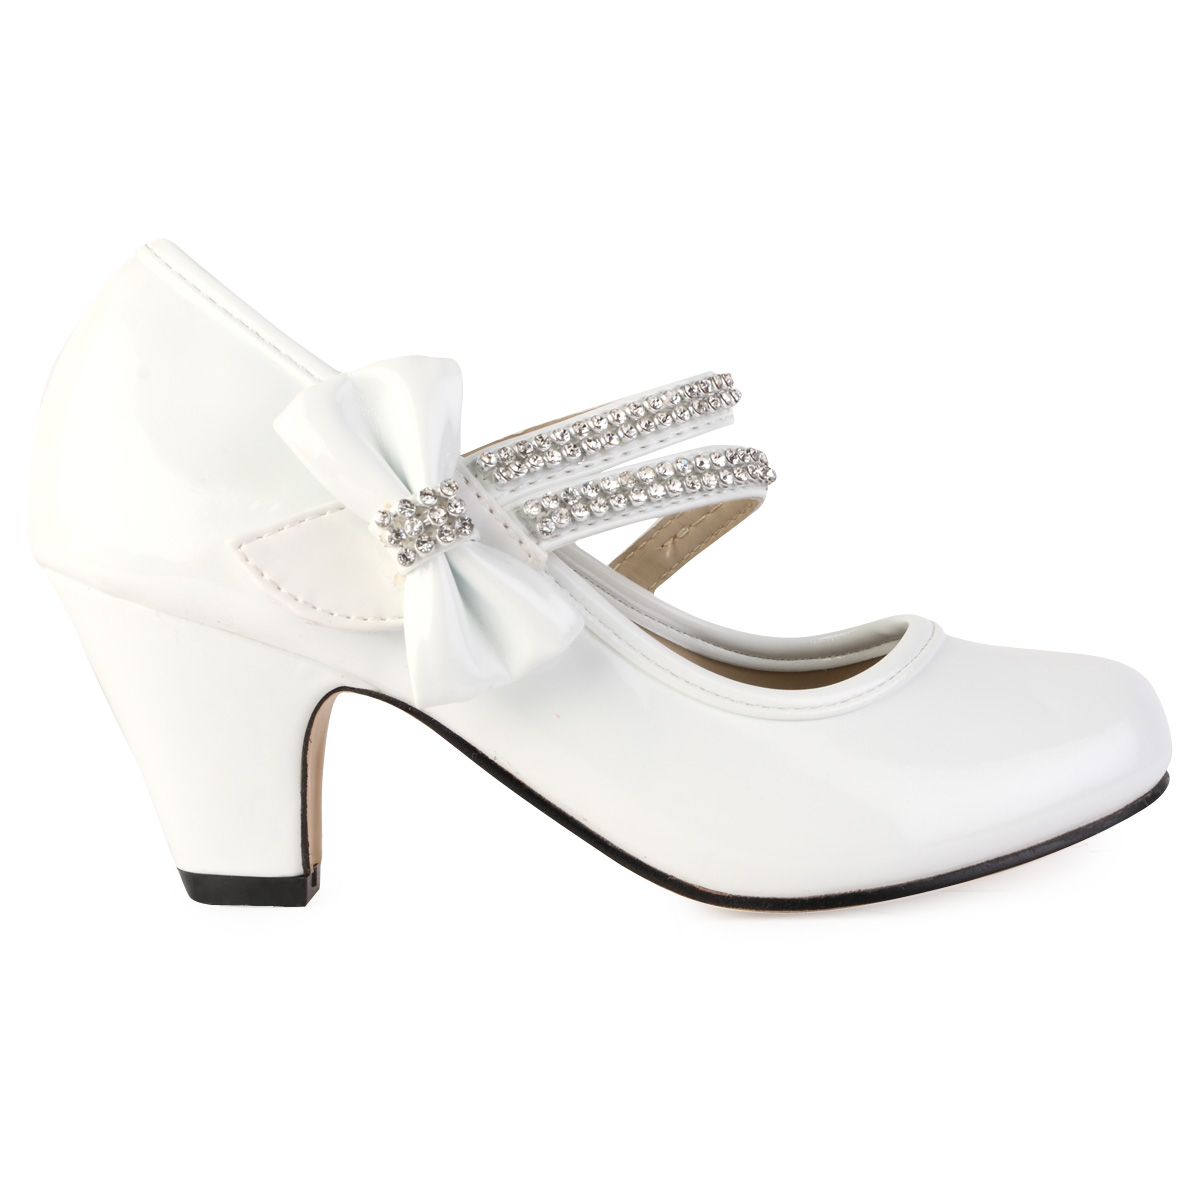 White patent shiny girls heeled diamante mary jane party shoes size 10